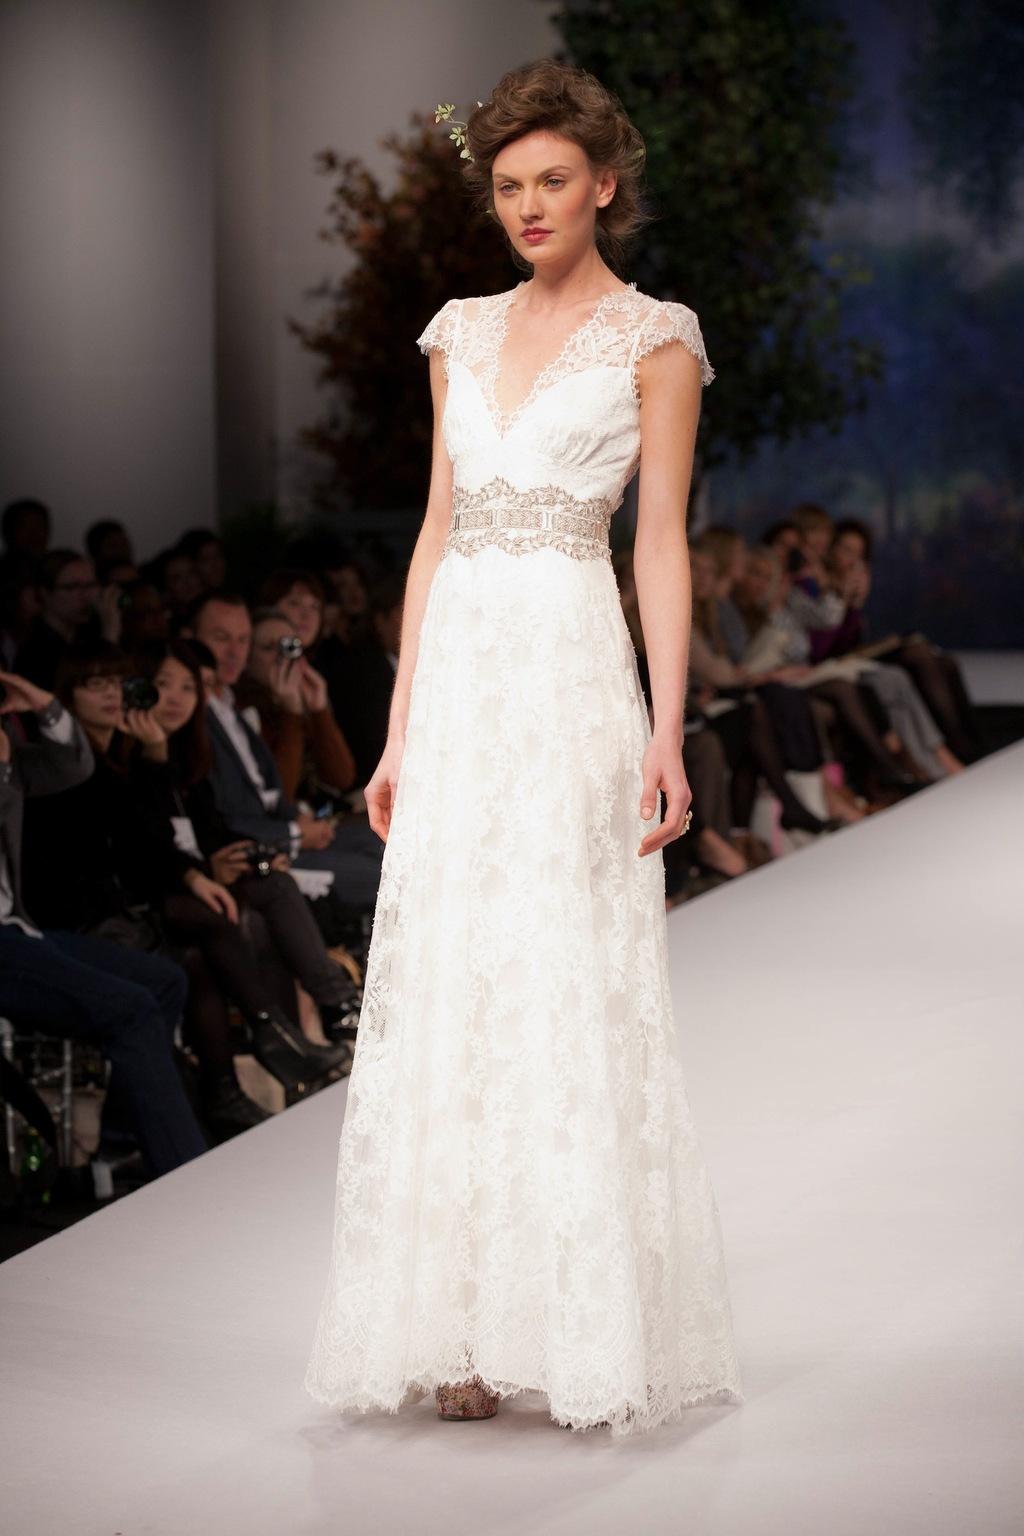 Spring_2012_wedding_dress_claire_pettibone_brigitte.full